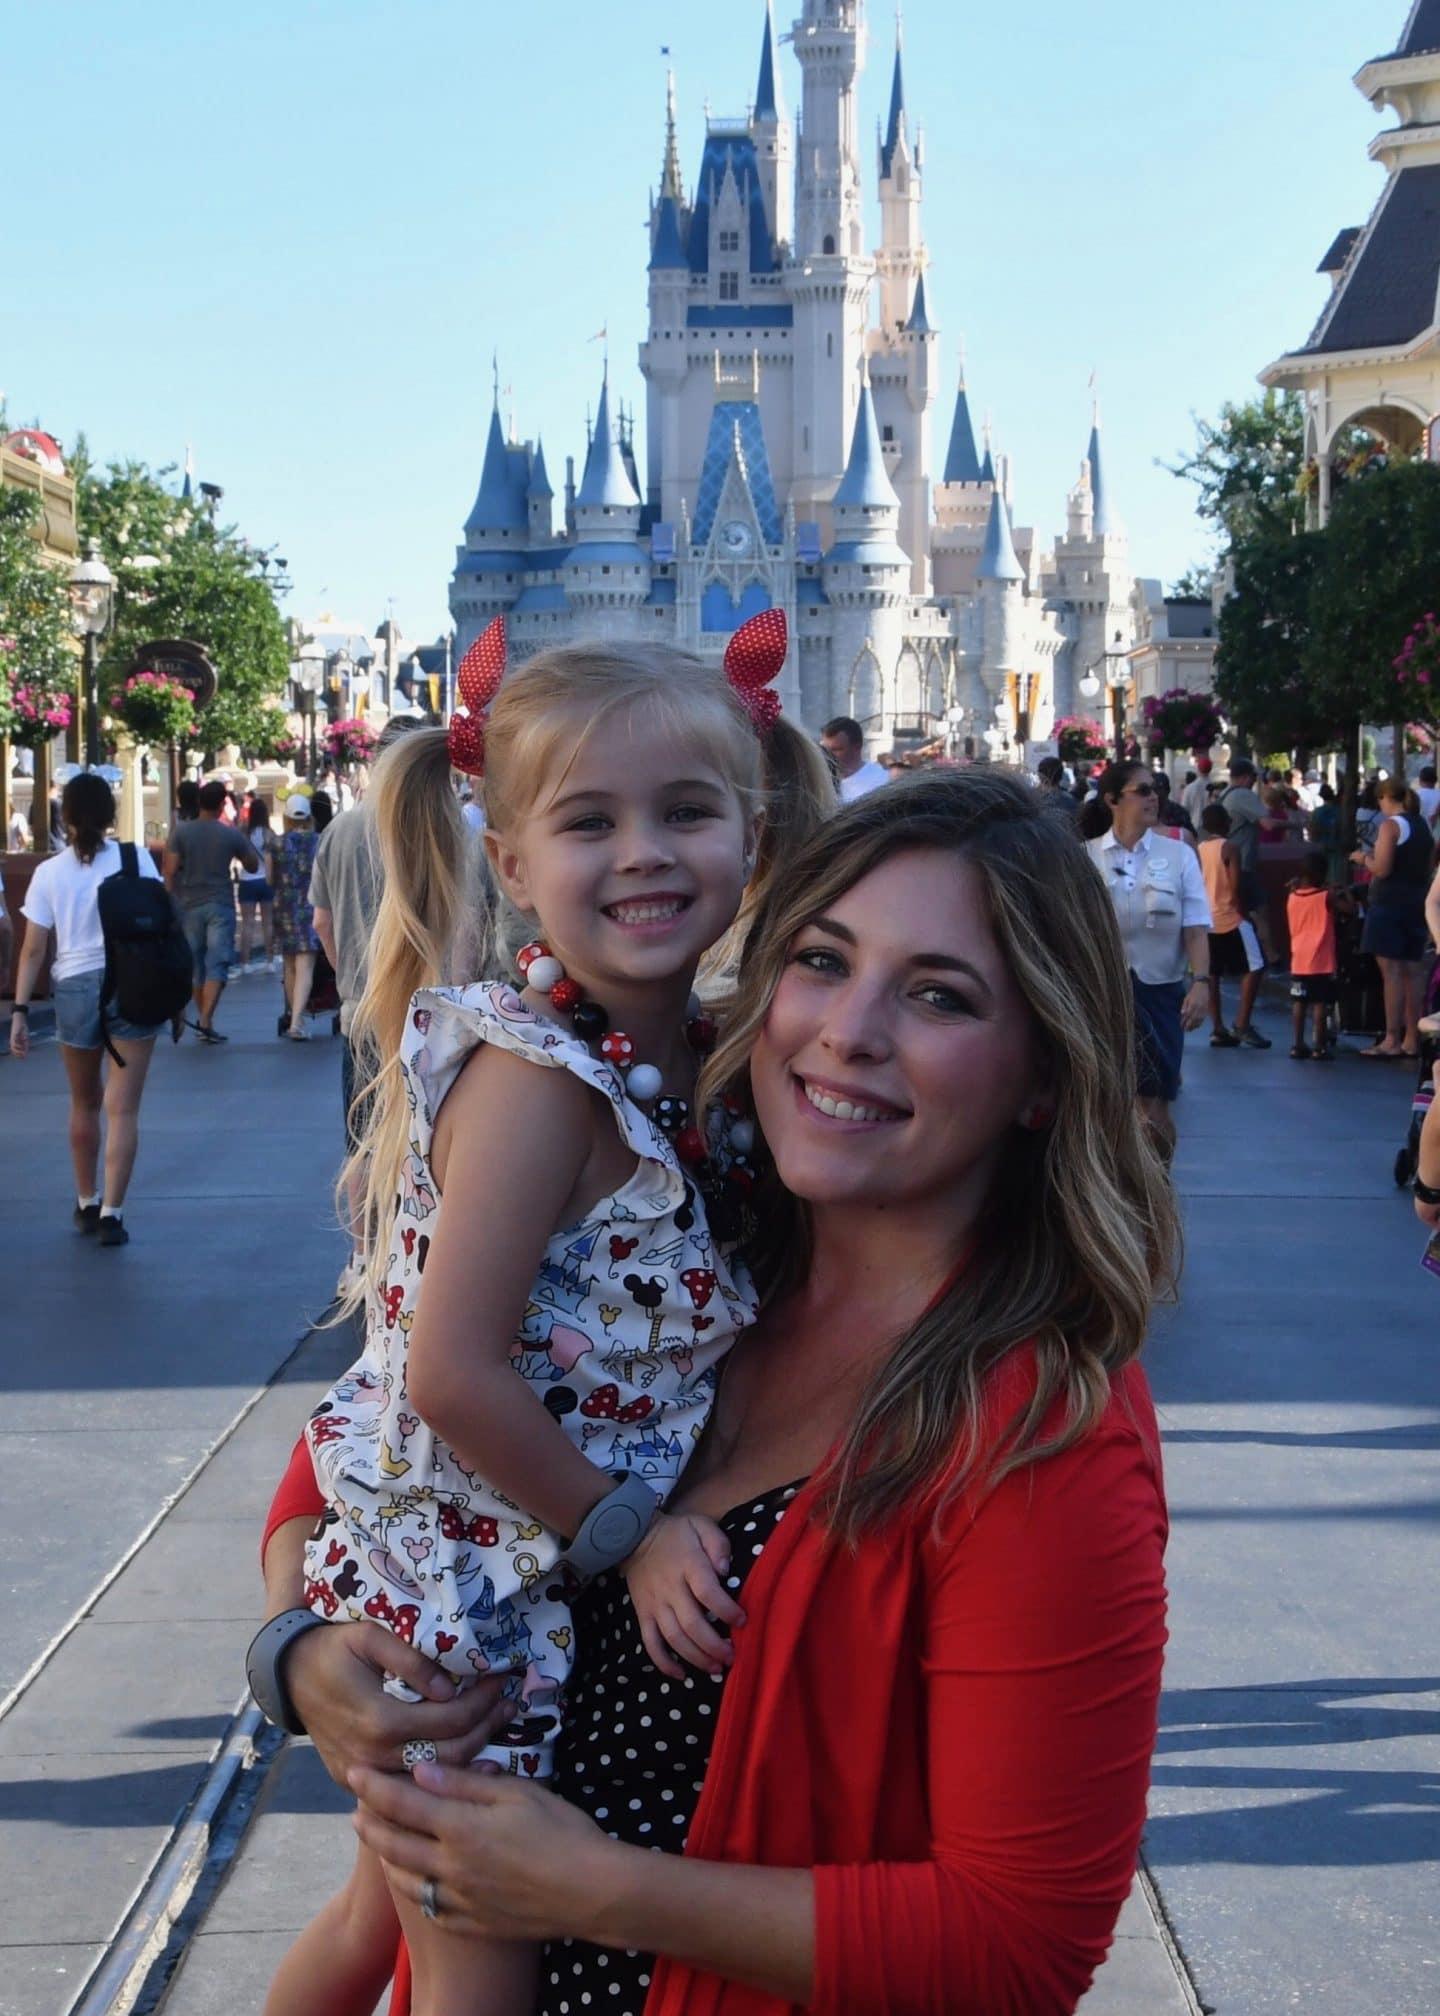 magic kingdom cinderella's castle mother and daughter photos